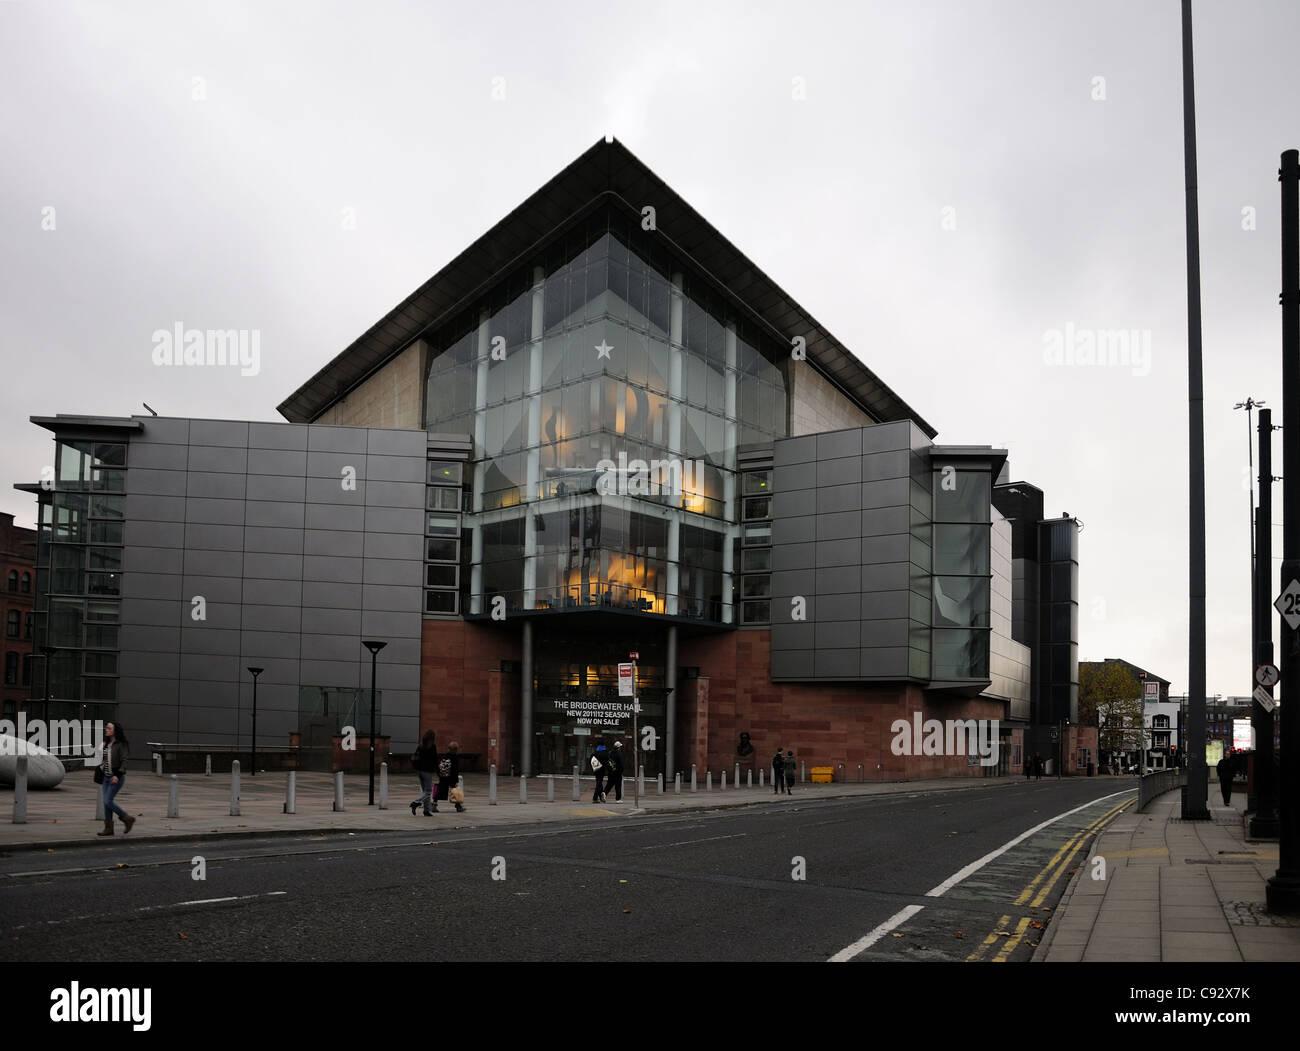 The Bridgewater Hall, Manchester - Stock Image